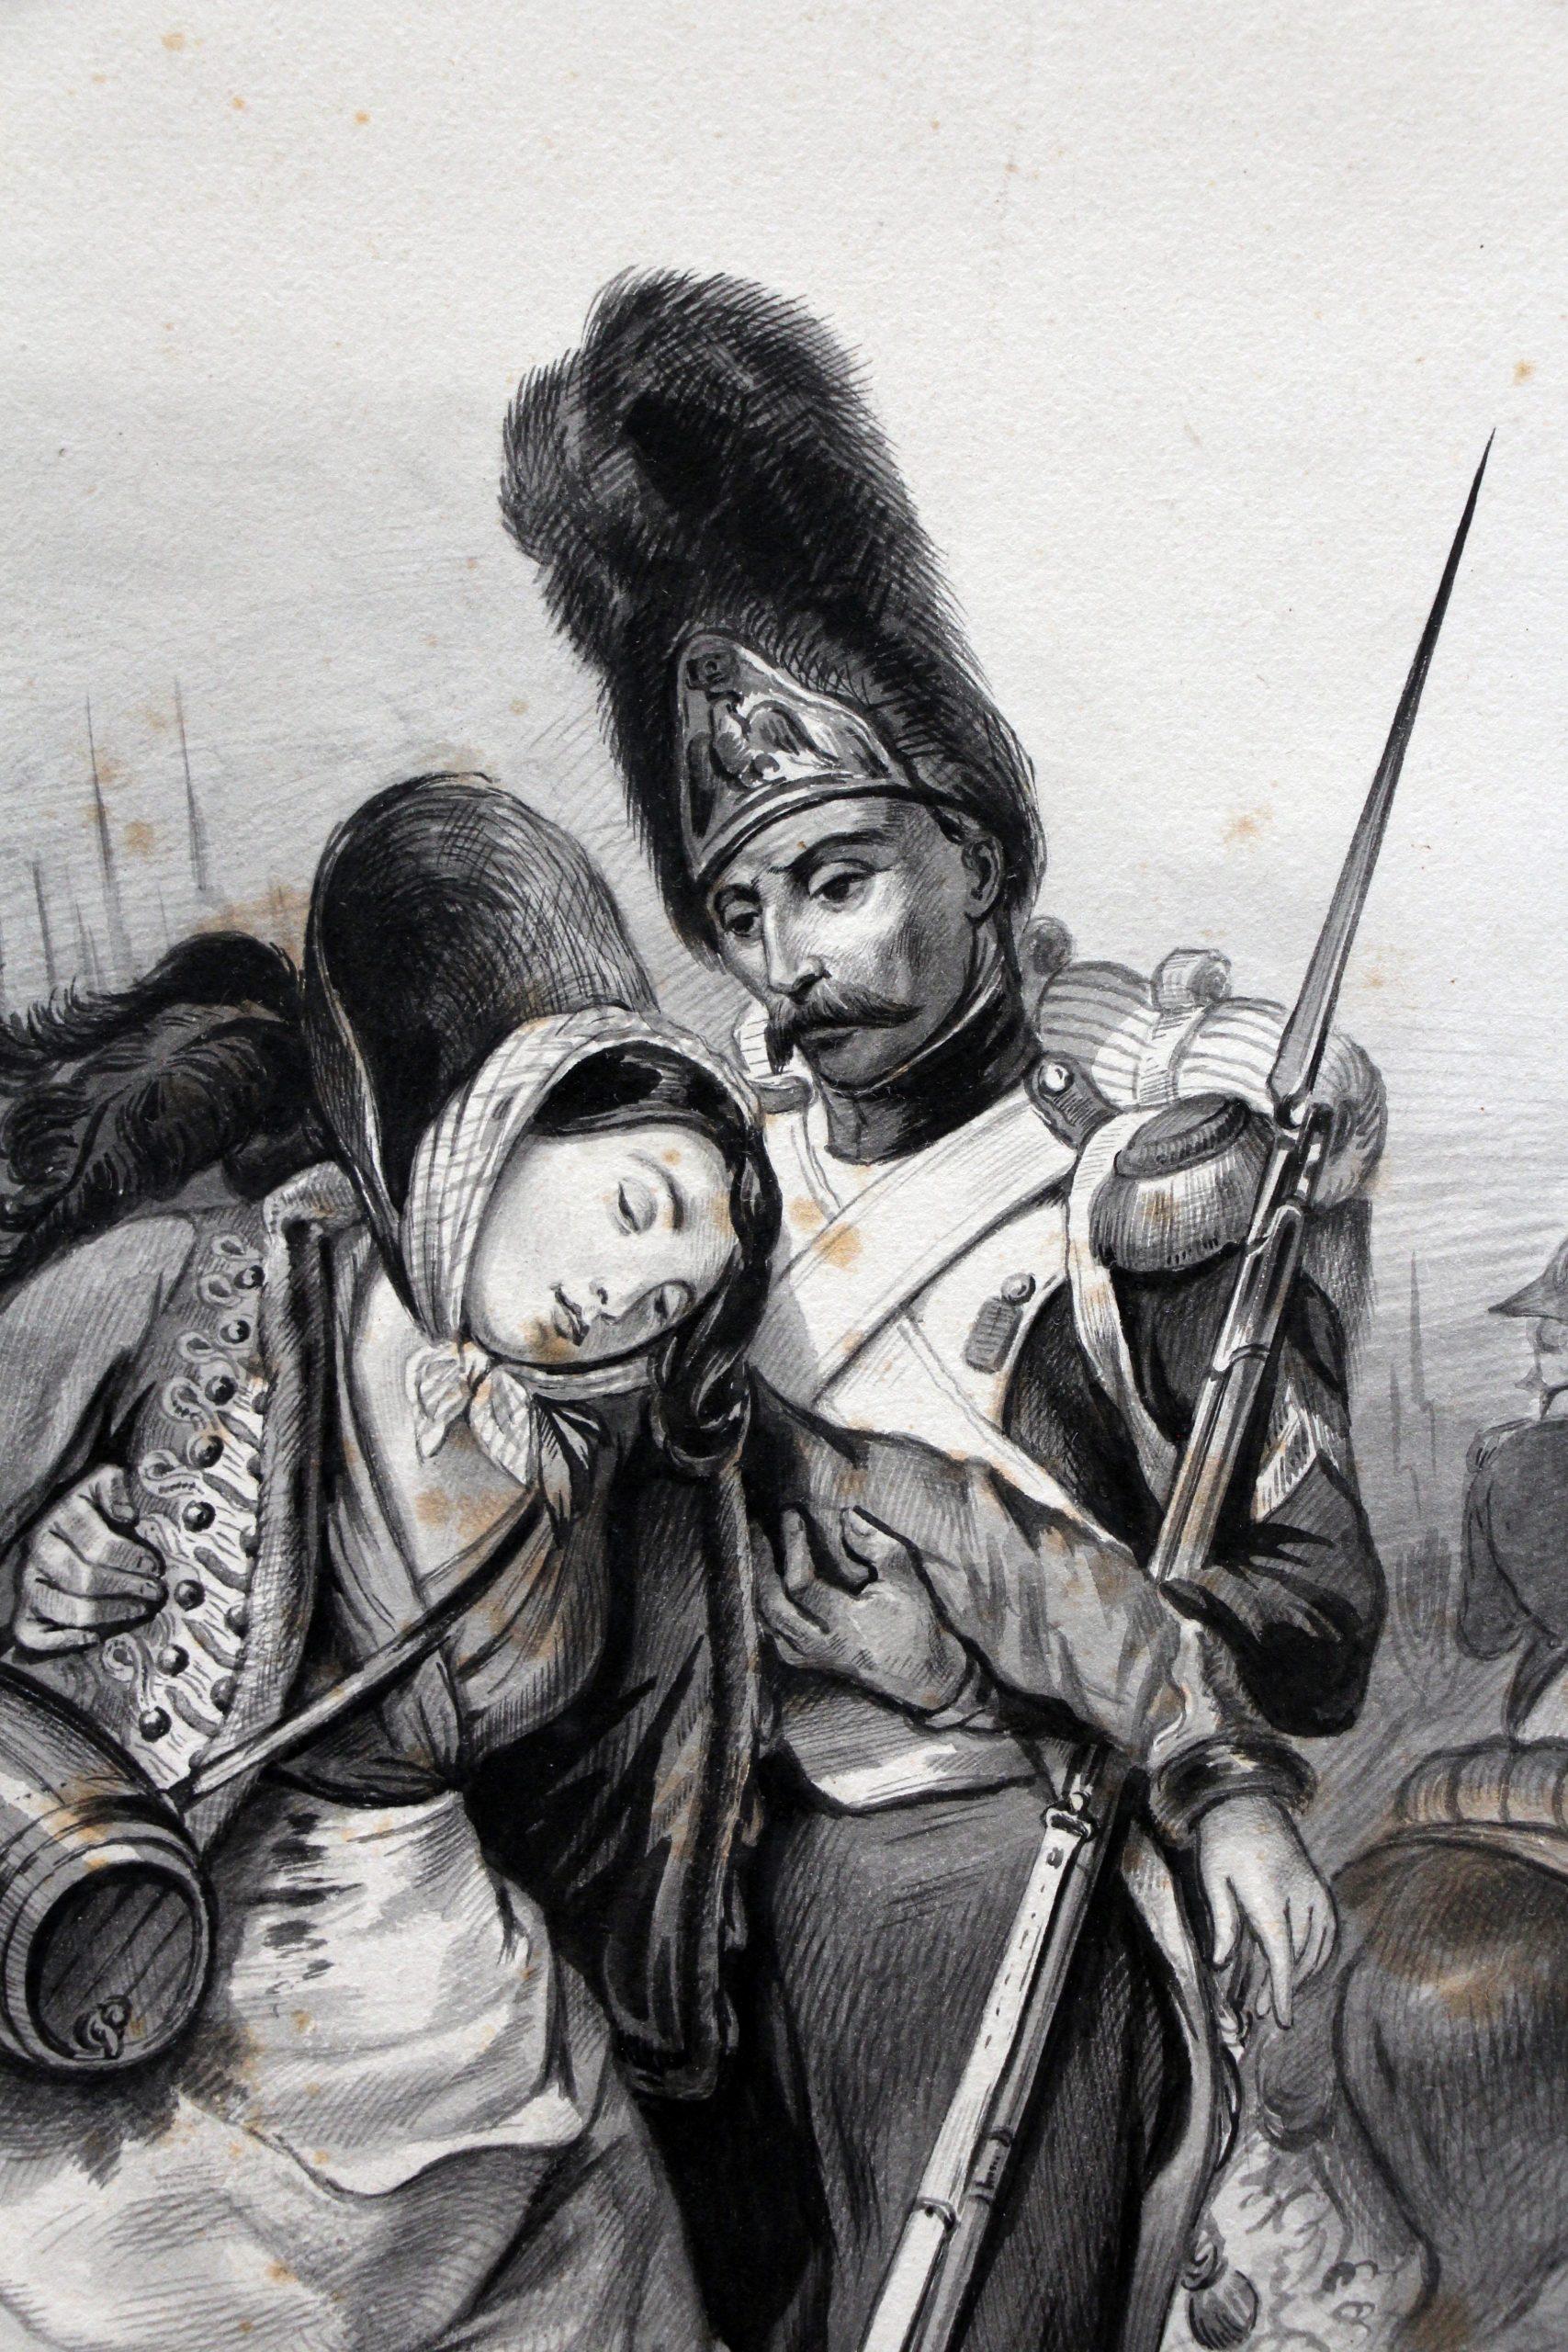 Grand dessin plume encre original - Scène 1814 - Invasion France - Napoléon 1er - 1er Empire - Grenadier Garde - Craonne - 1814 - Cantinière